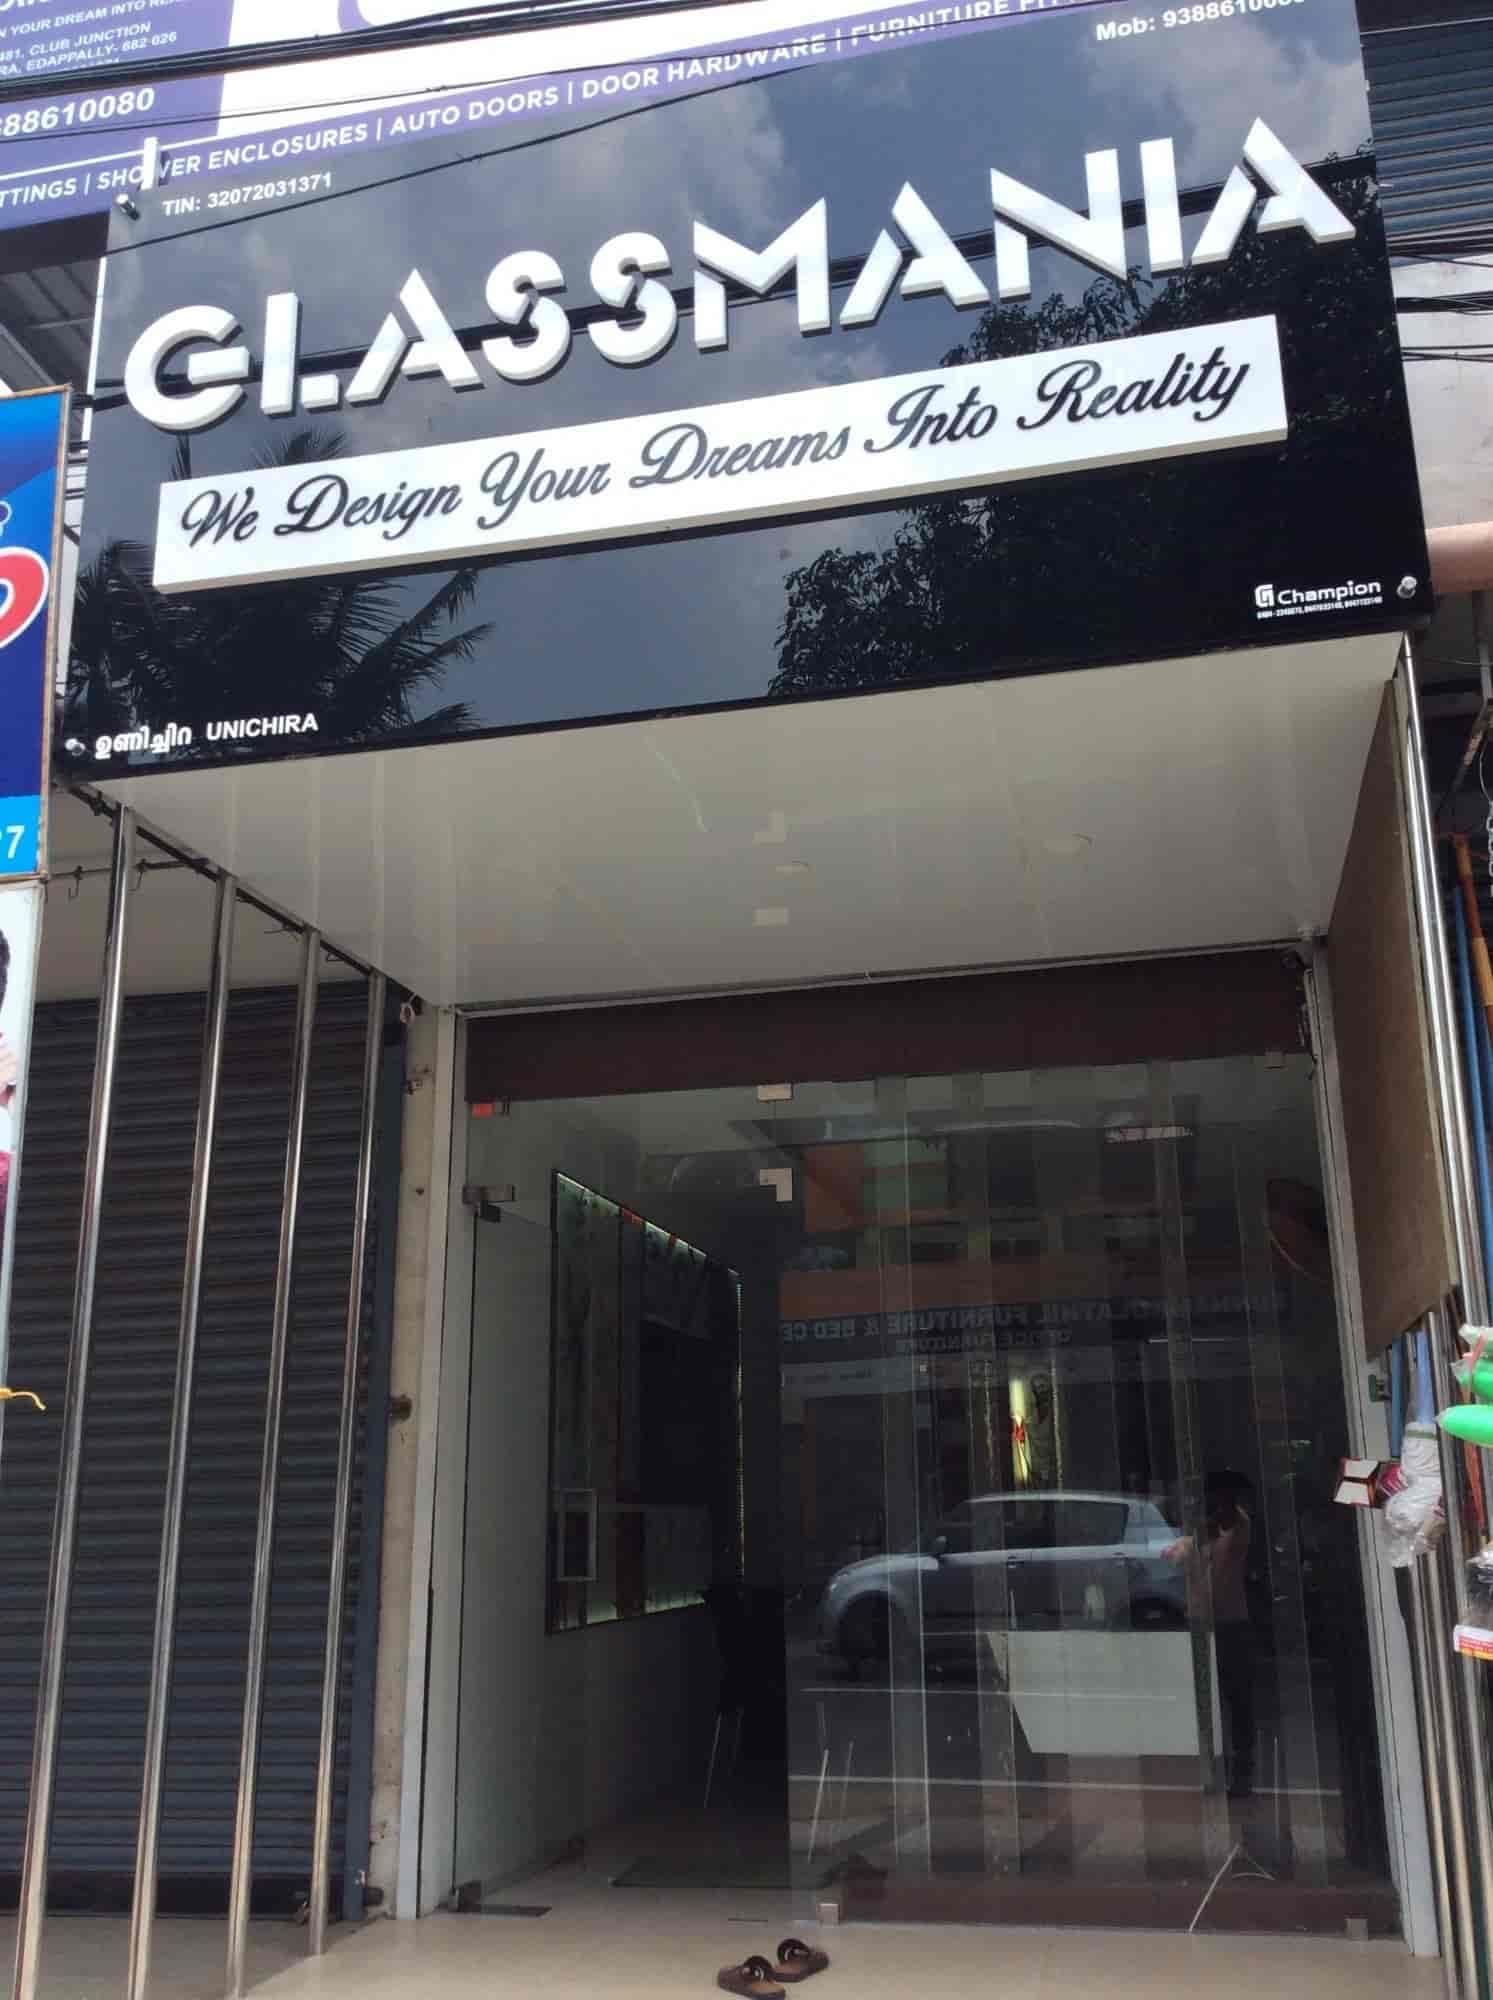 b6407a3248131 Glassmania